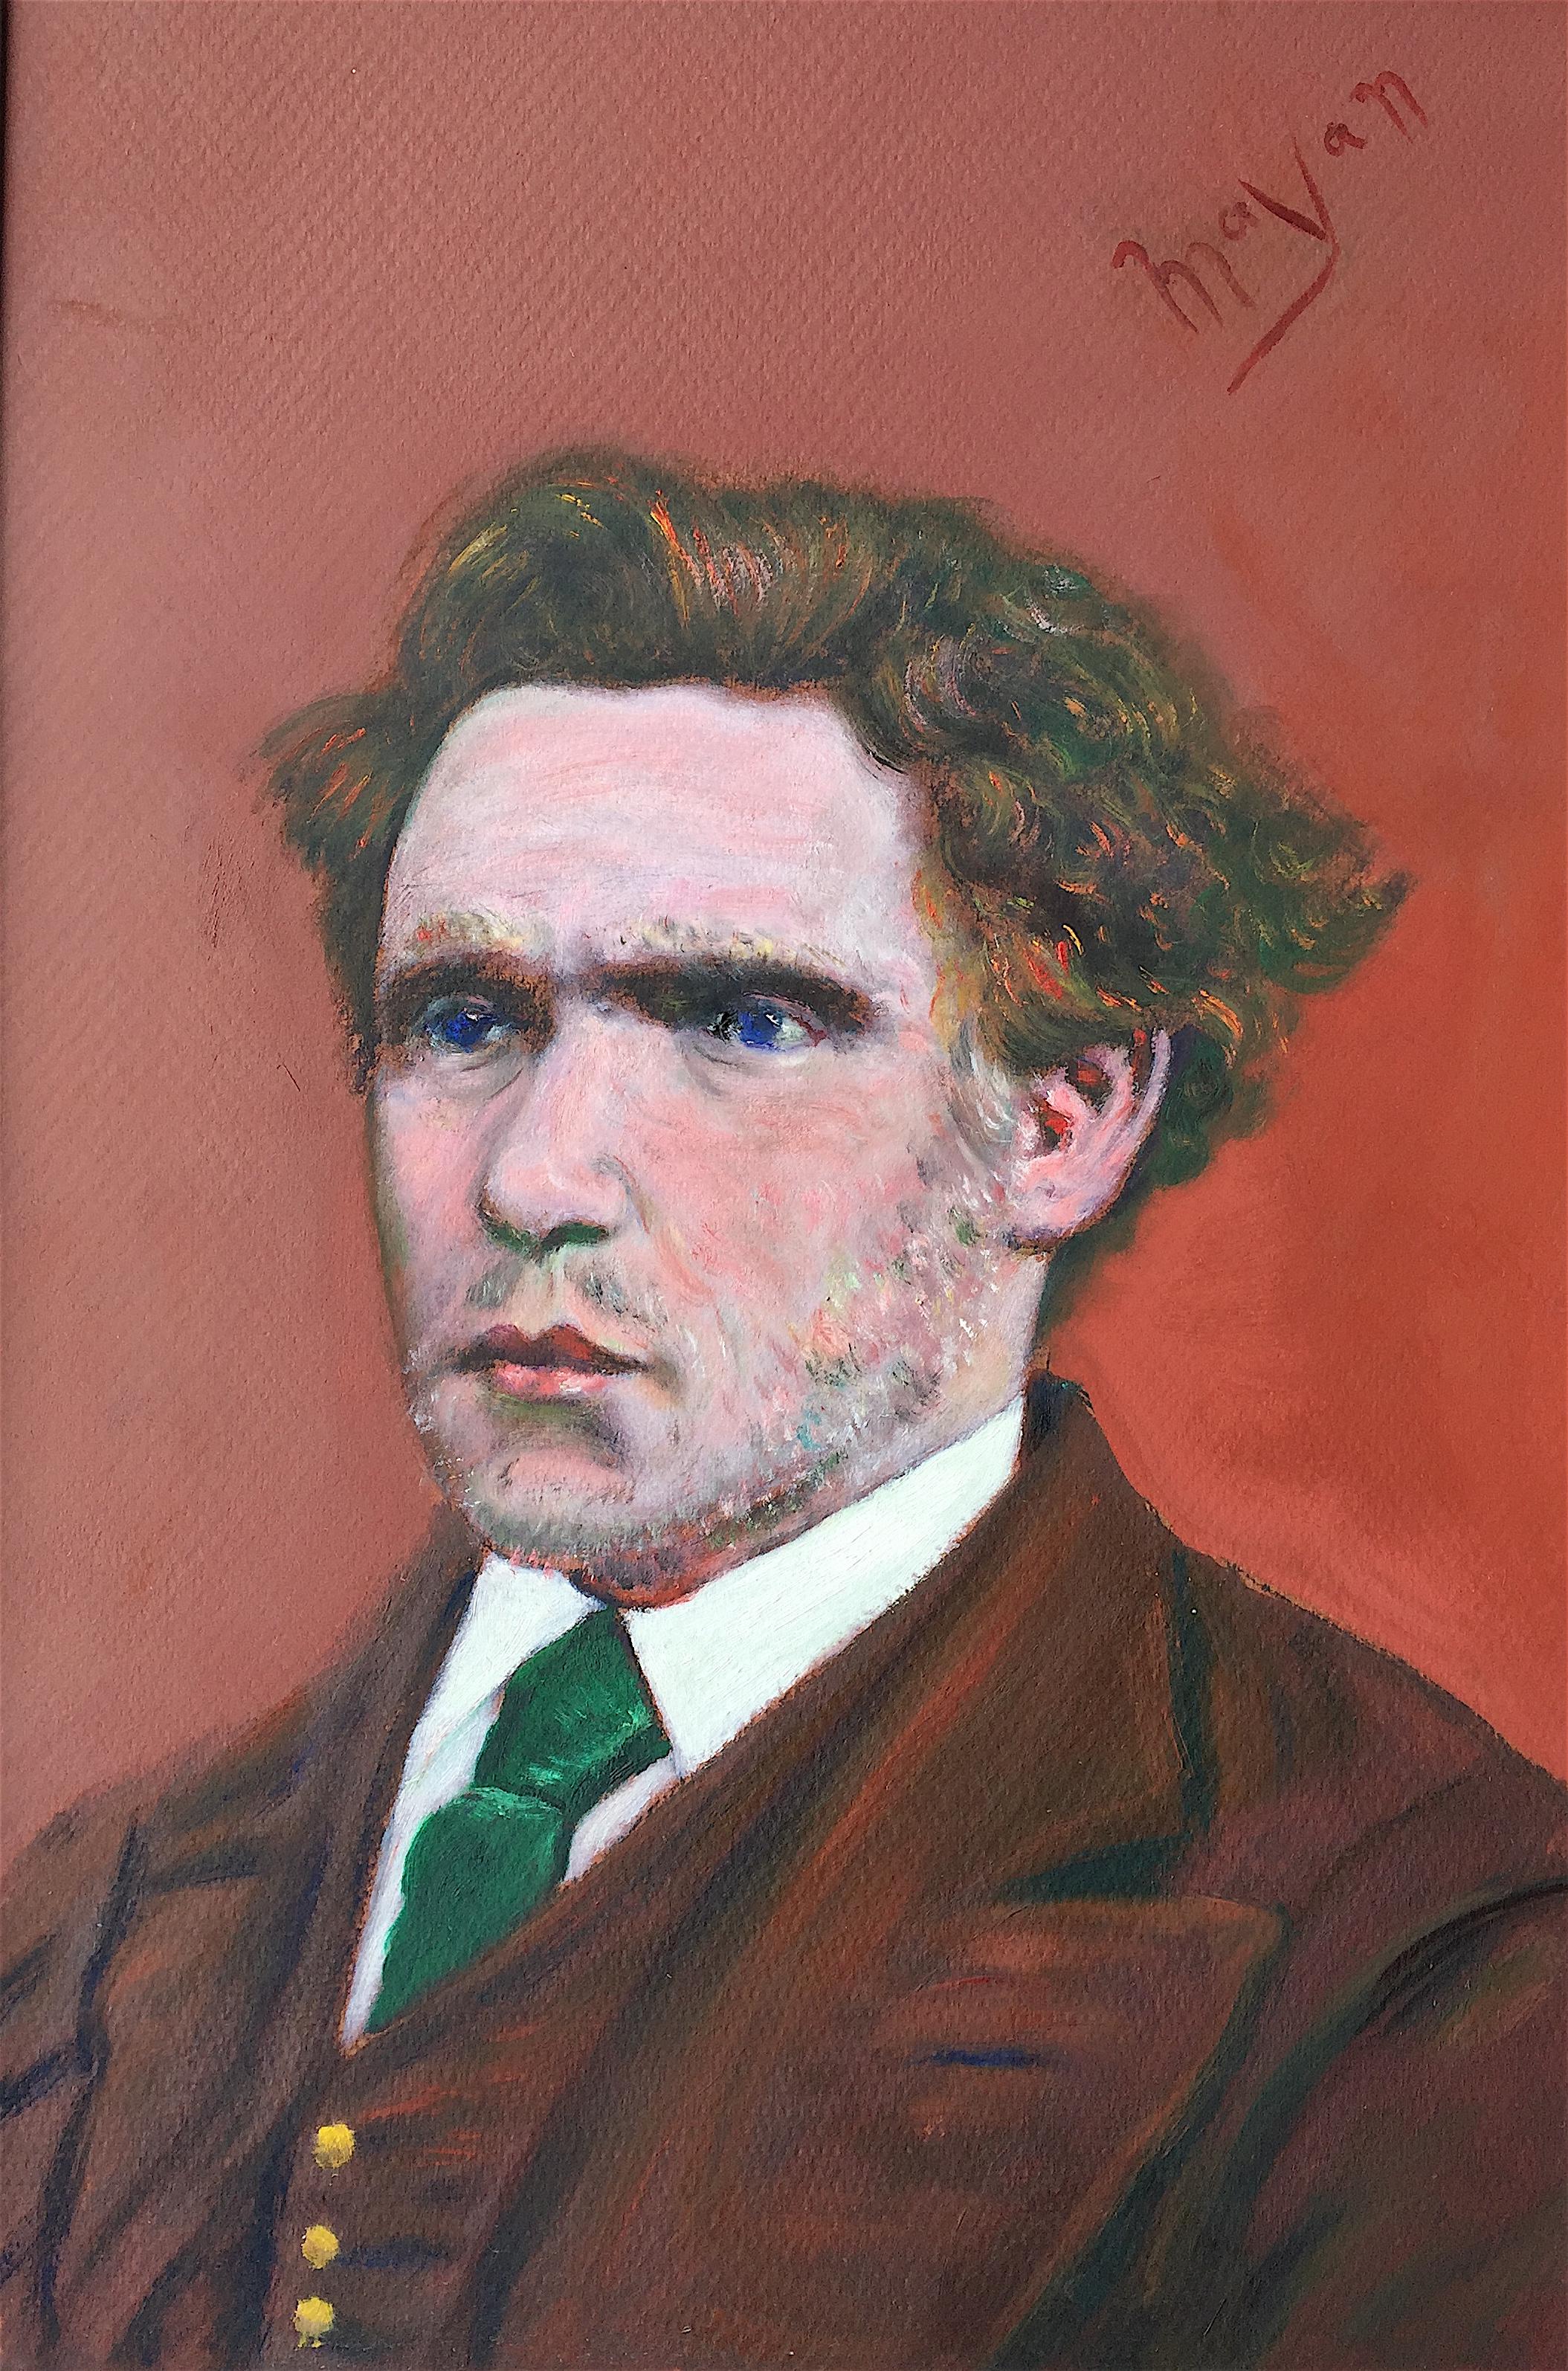 Van Gogh As A Young Man